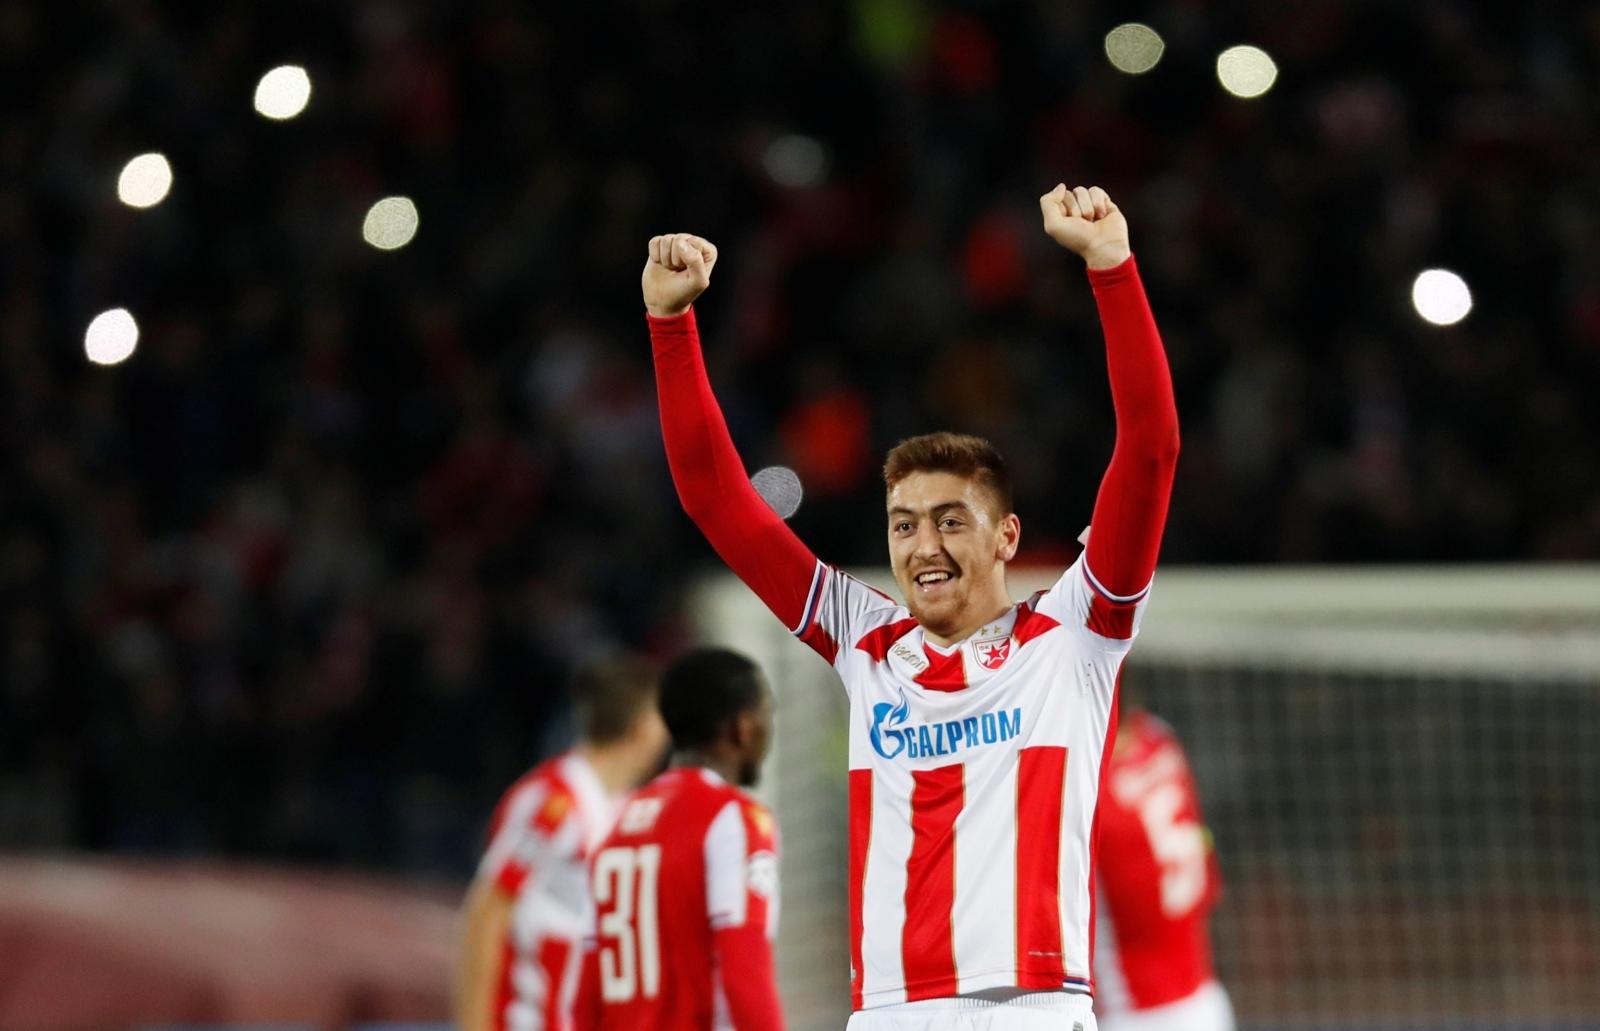 LIGA PRVAKA Remi Intera i Barce, Zvezda iznenadila Liverpool